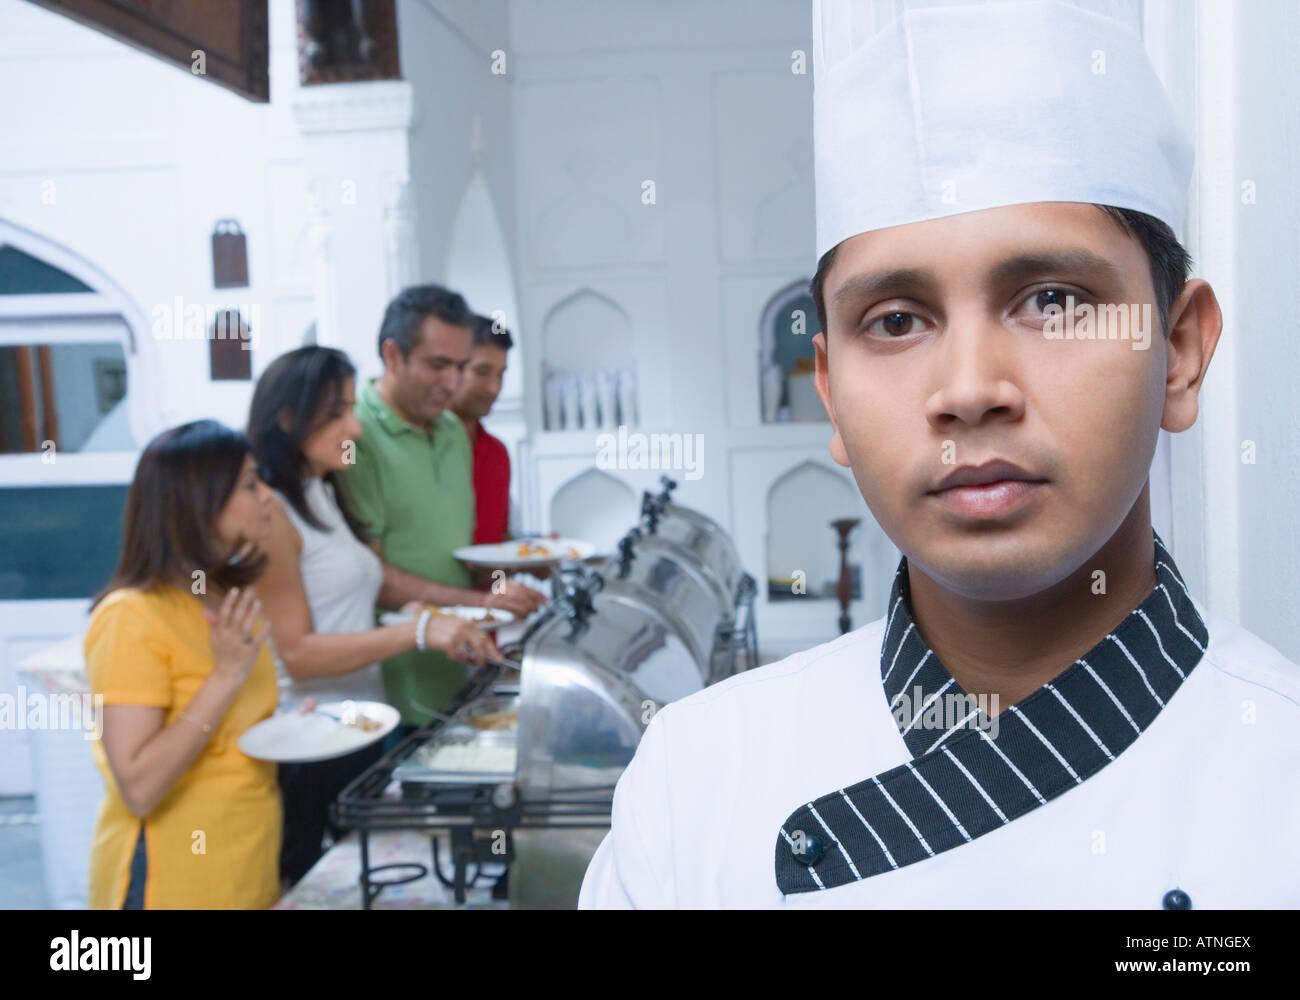 Indian Hospitality Stock Photos Amp Indian Hospitality Stock